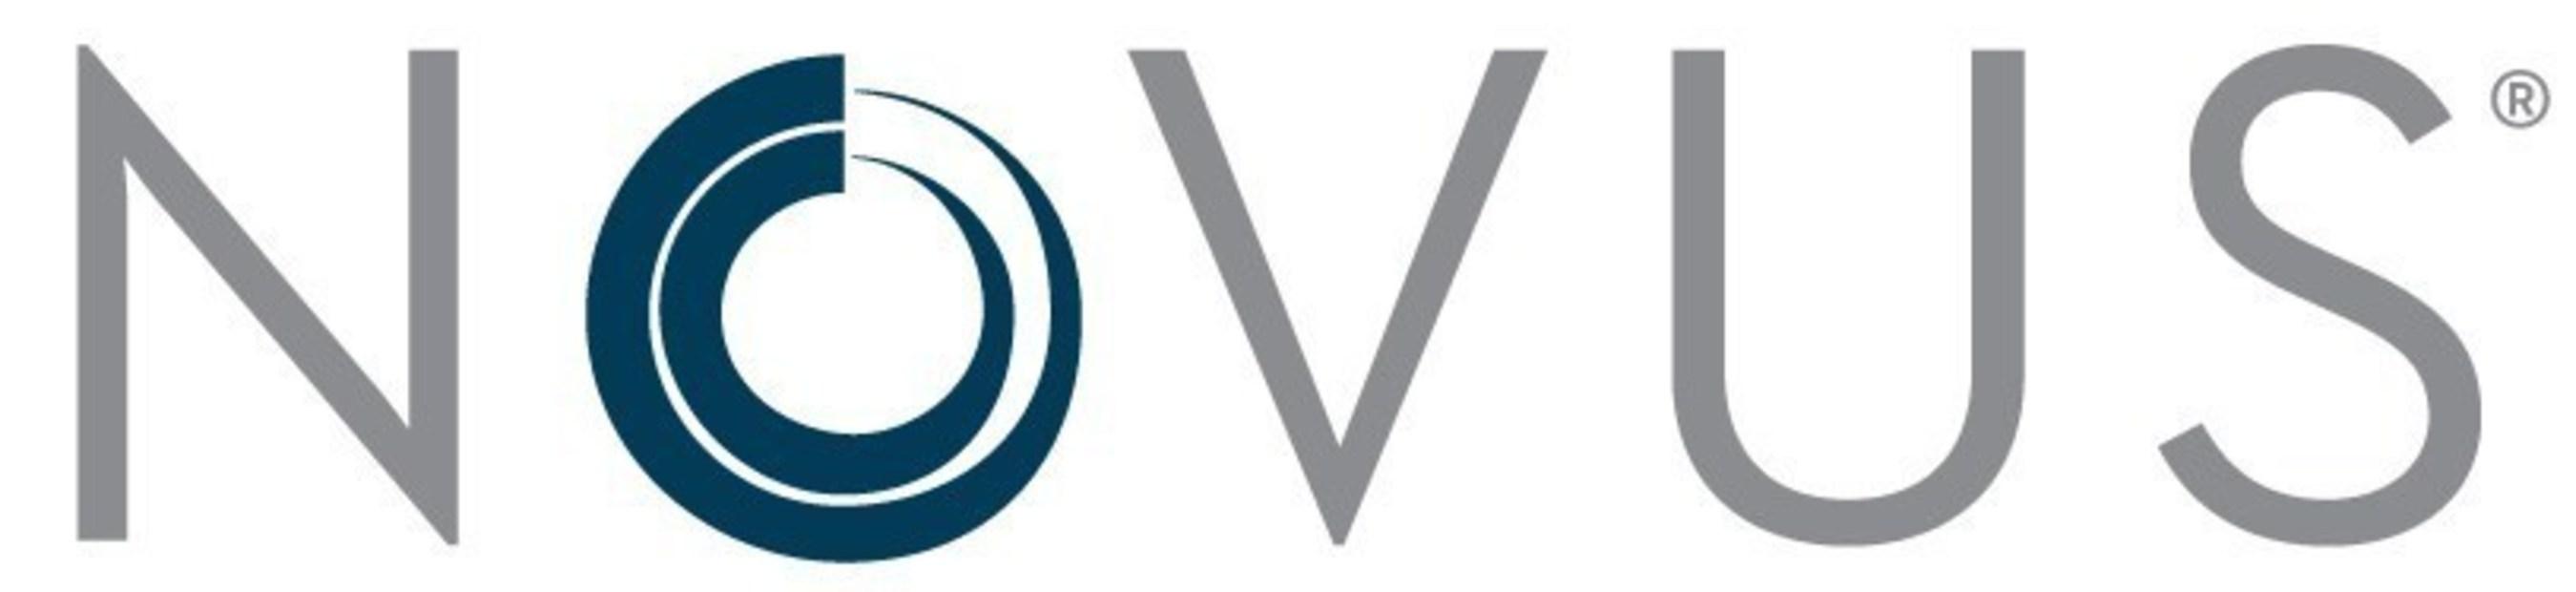 Novus International, Inc. Revises Bulk Delivery SOPs to Improve Biosecurity